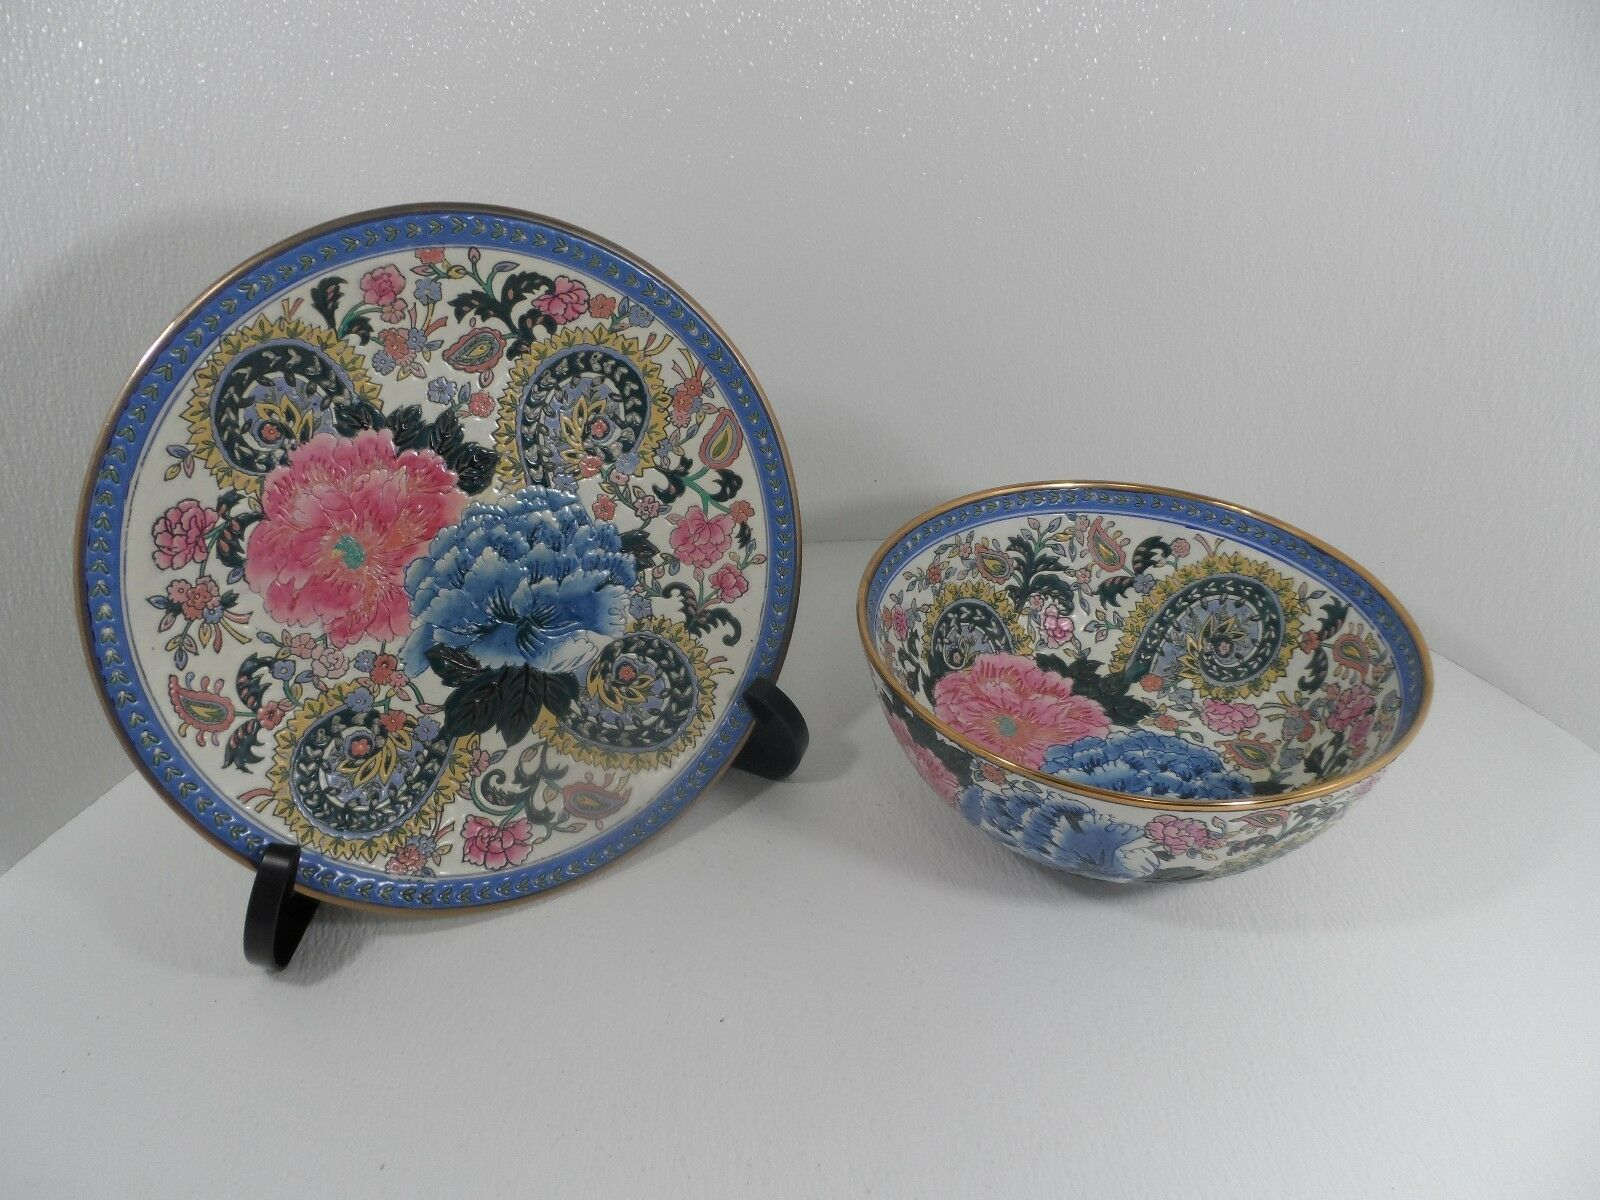 Andrea by Sadek Victoria Morland  Faience Decorative Plate 12  & Bowl 10  - GC